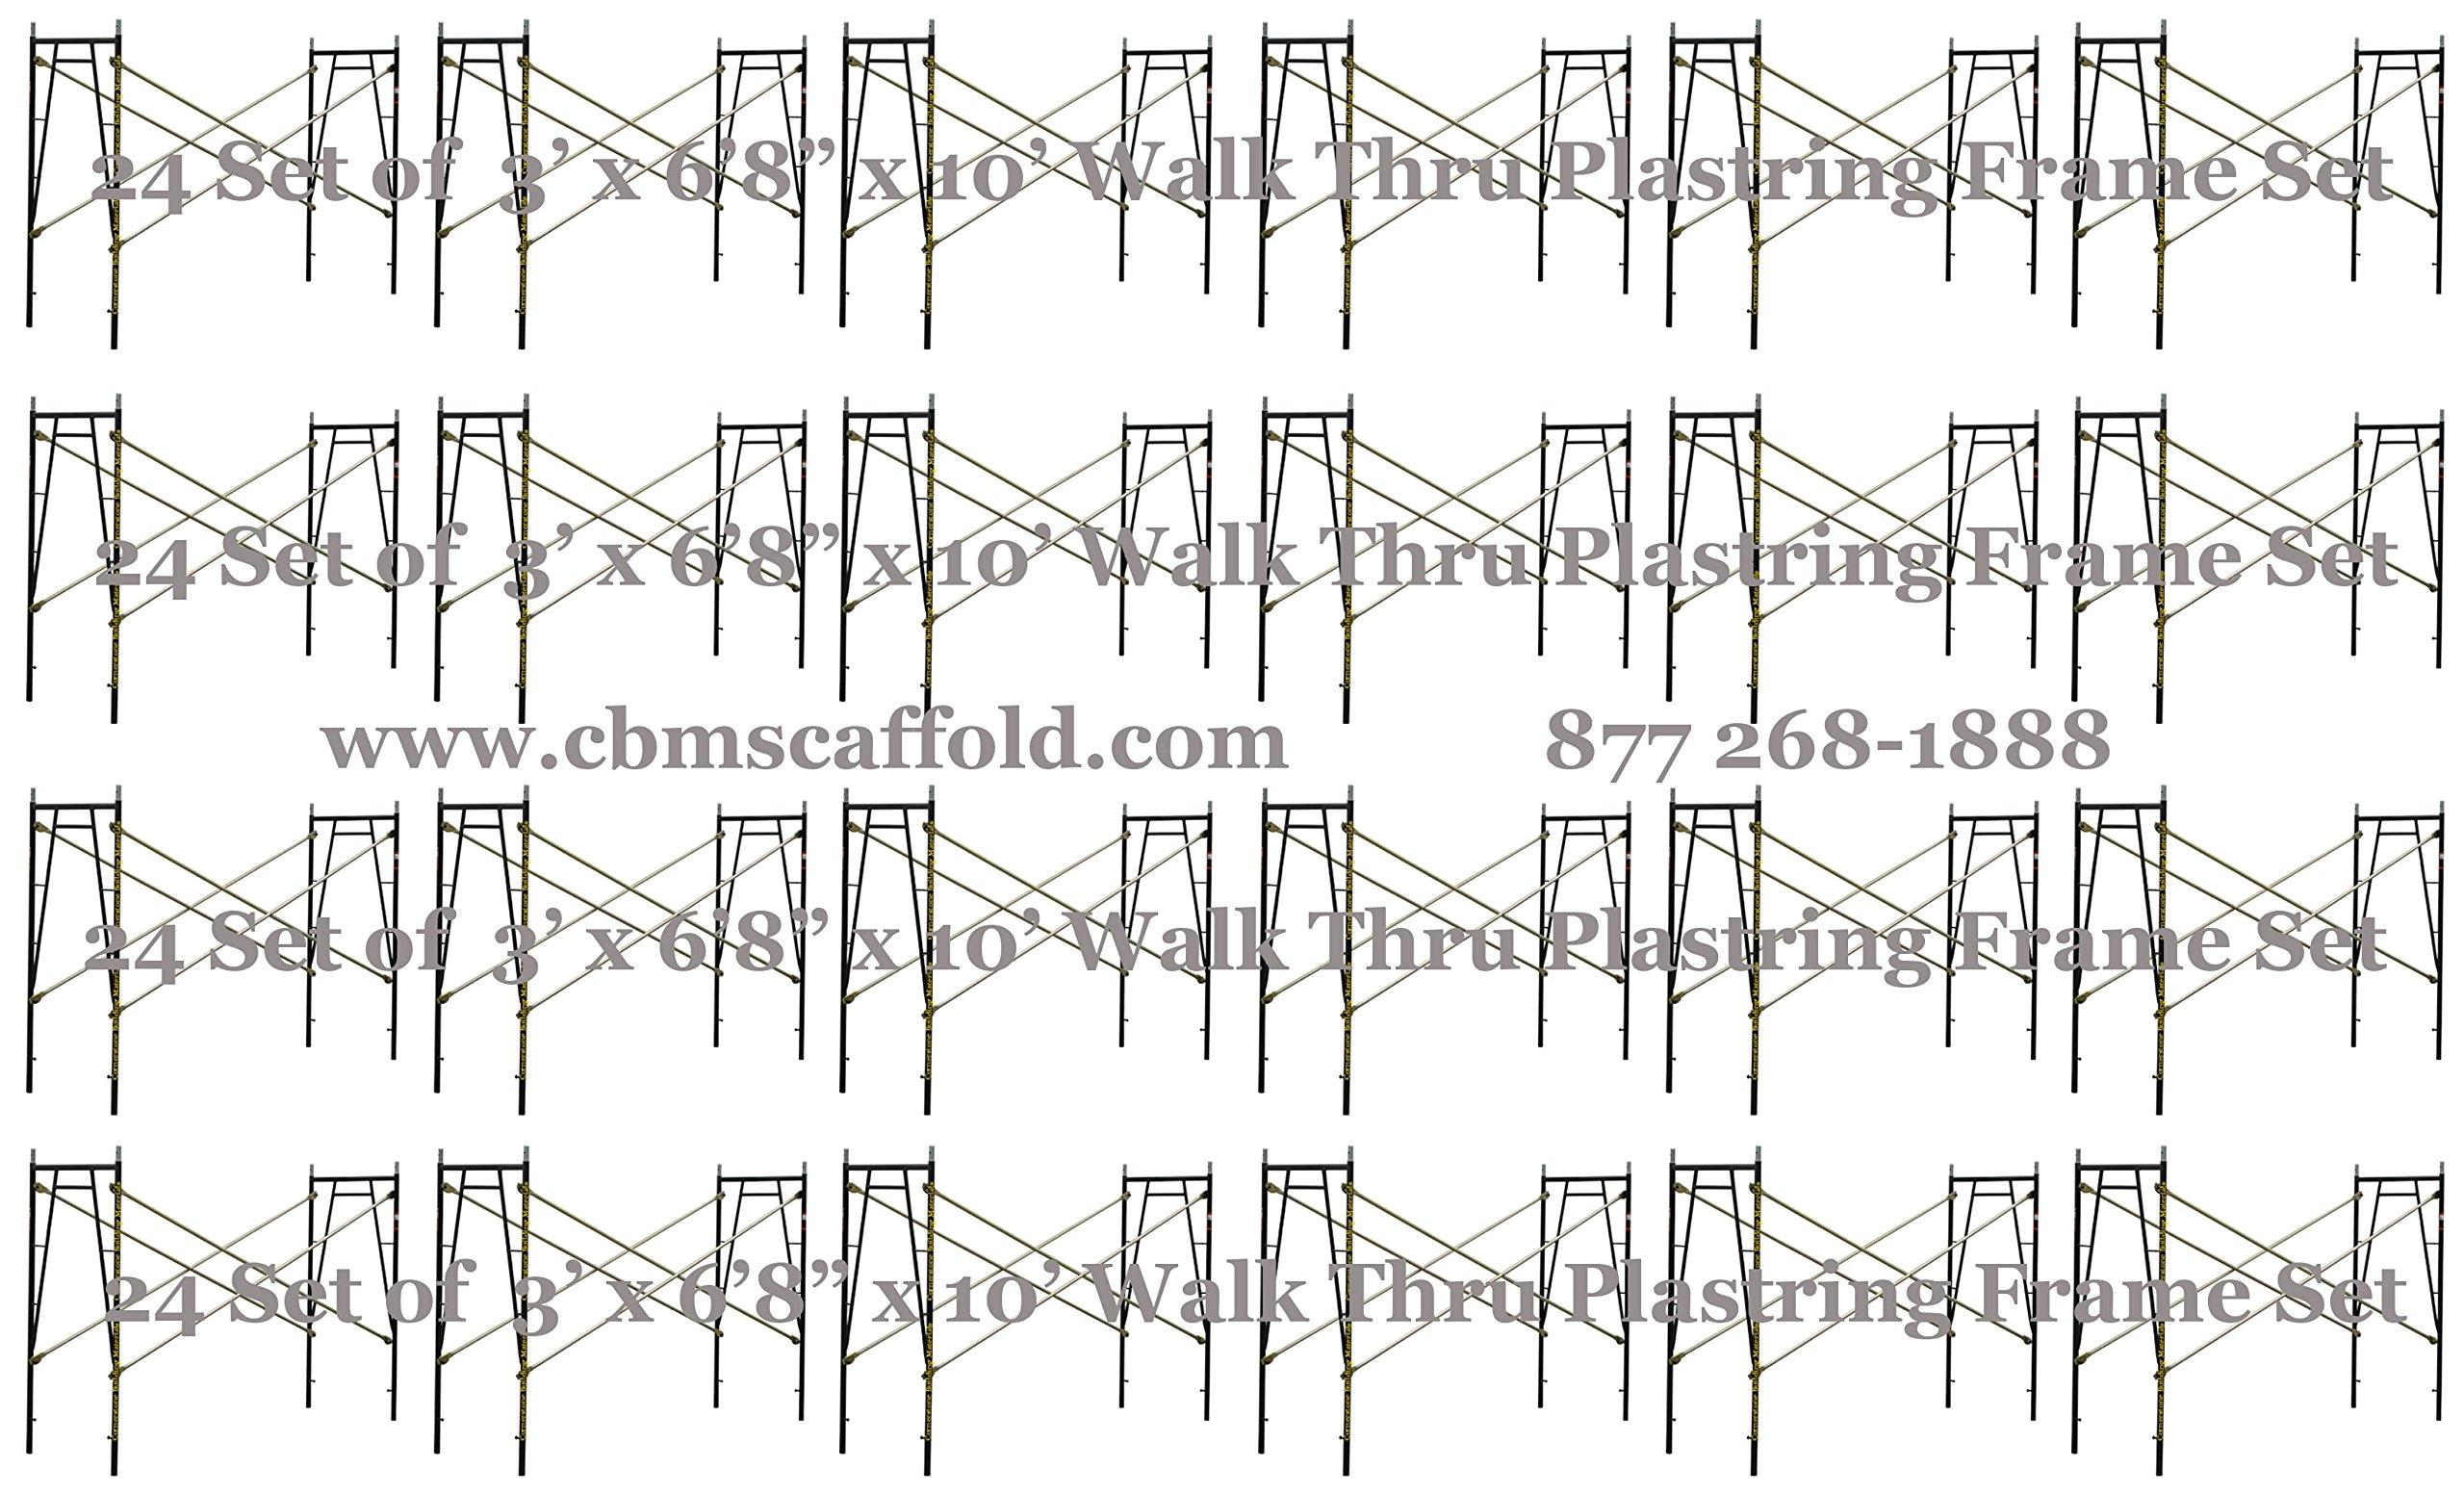 24 Set of 3' x 6'8'' x 10' Scaffolding frames for Plastering masonry work CBMscaffold. com